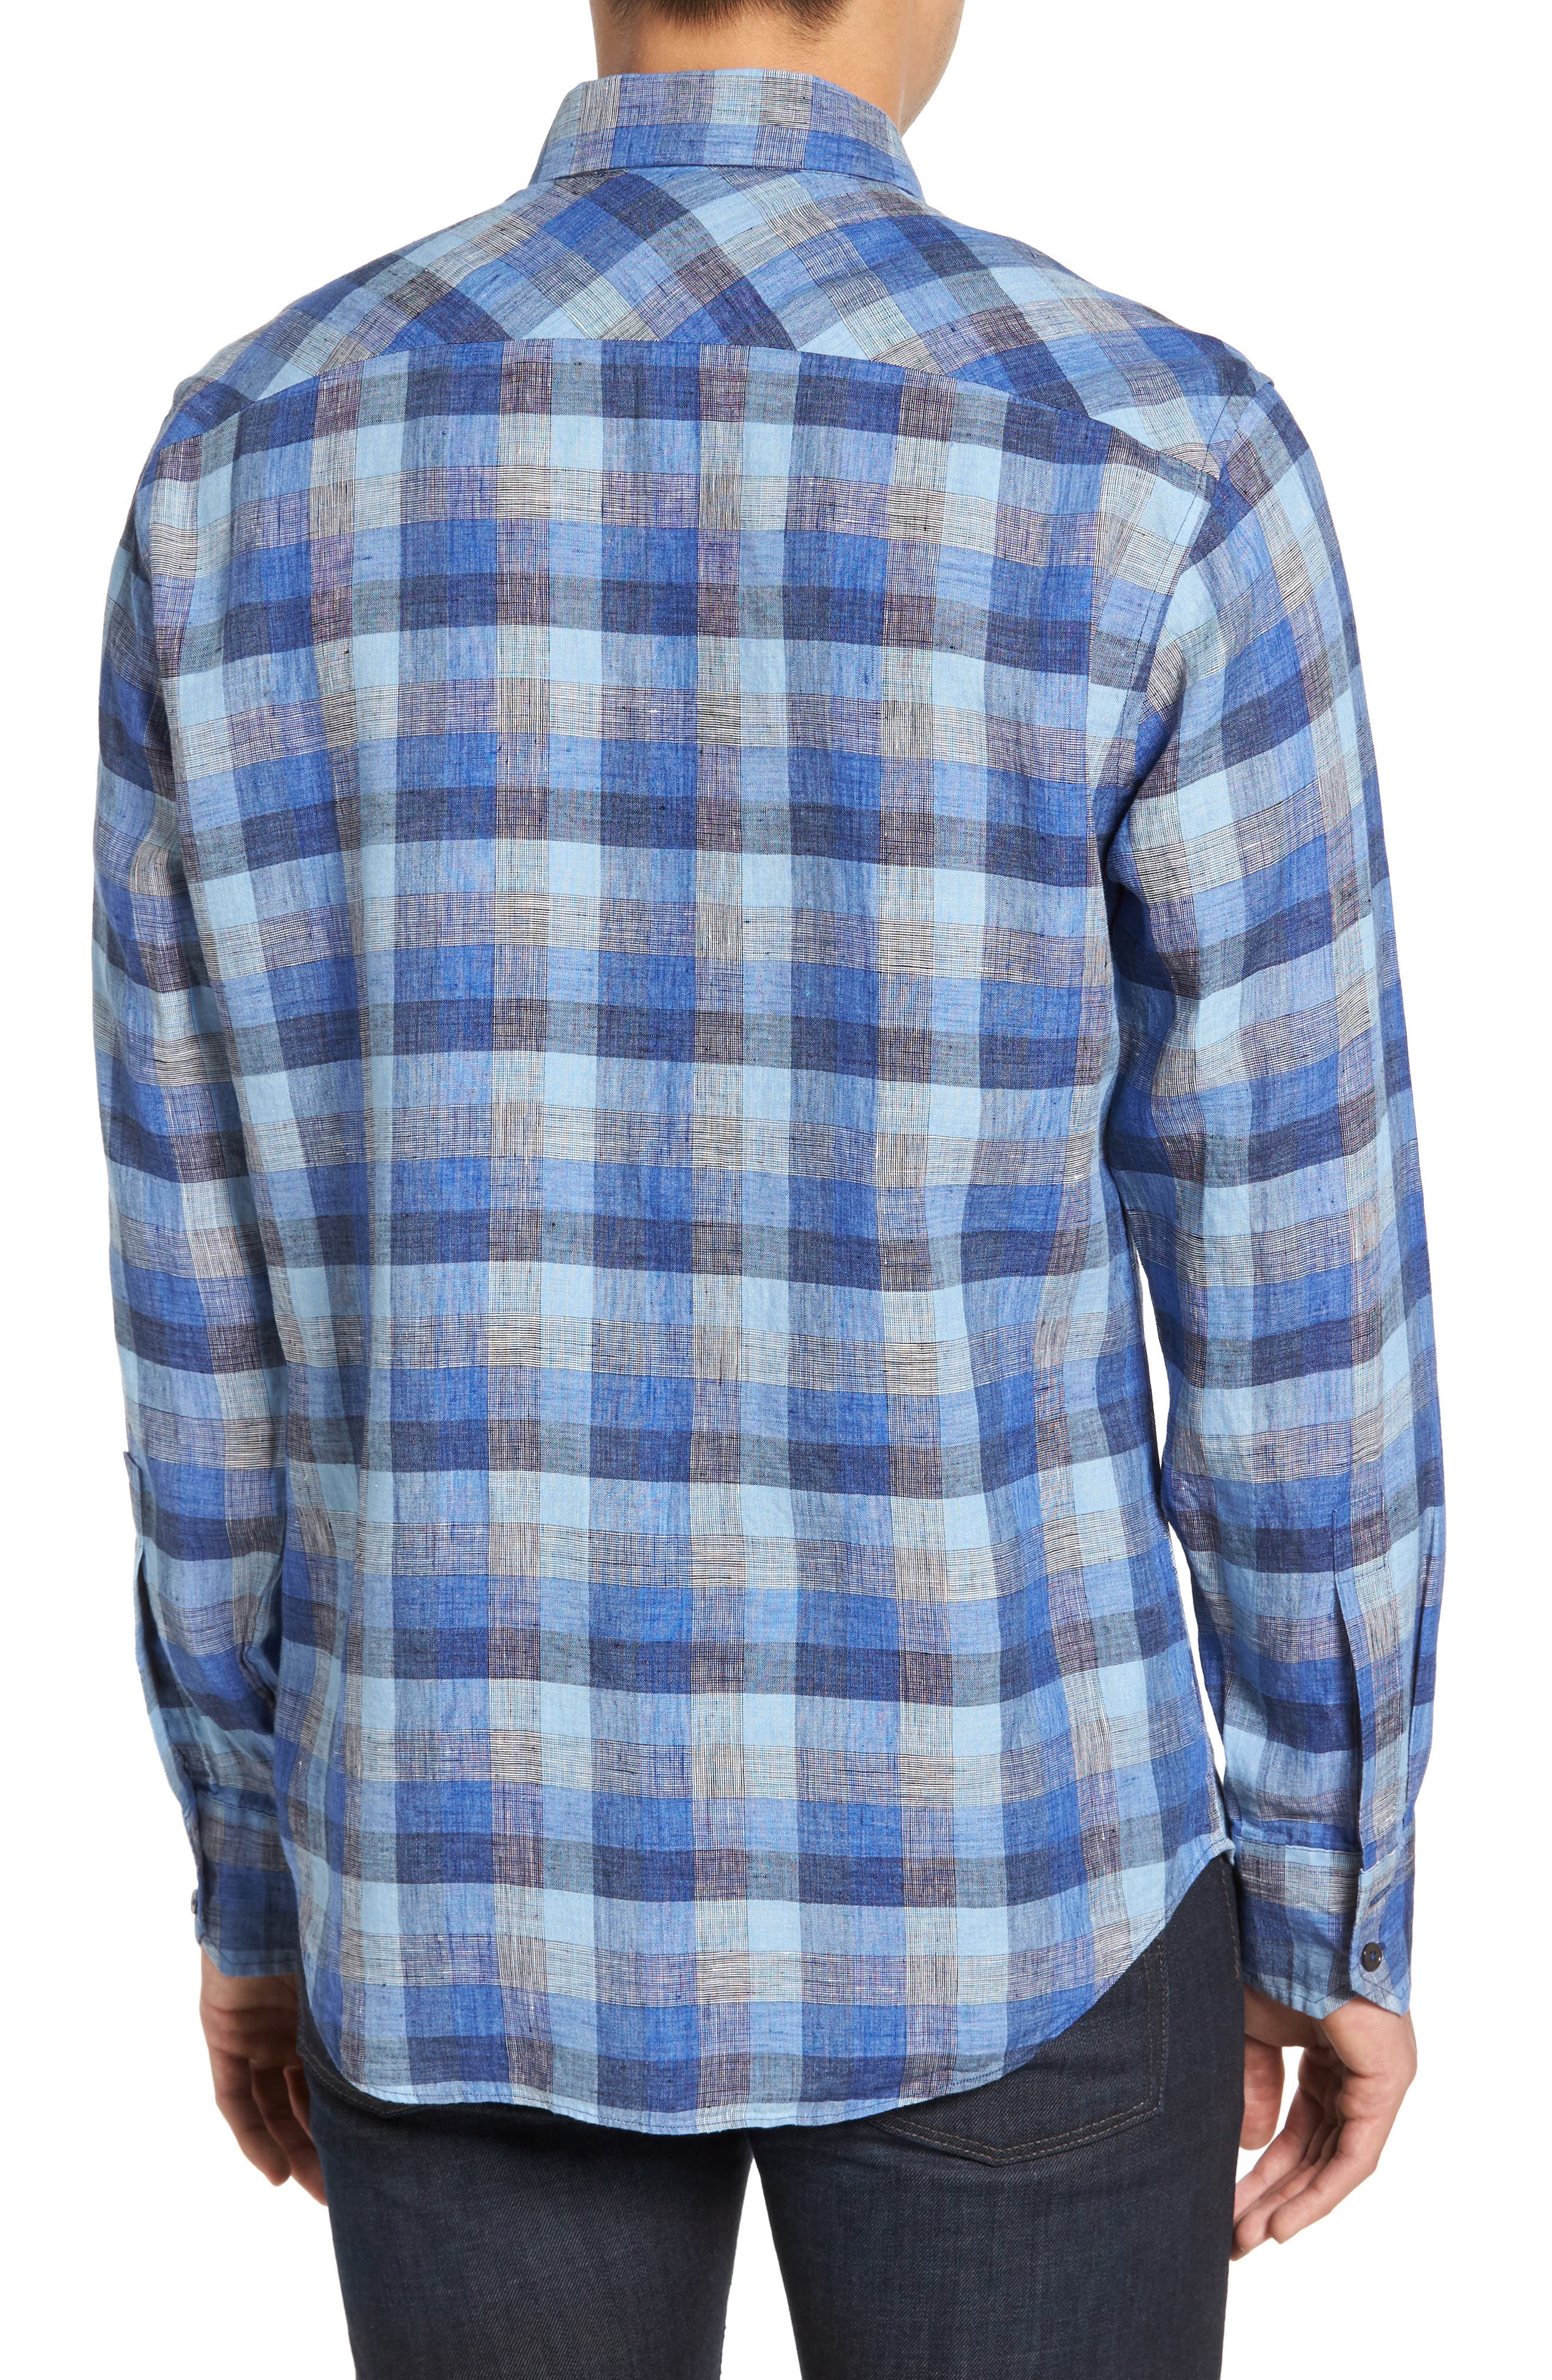 Kerner Plaid Sport Shirt,                             Alternate thumbnail 2, color,                             Blue